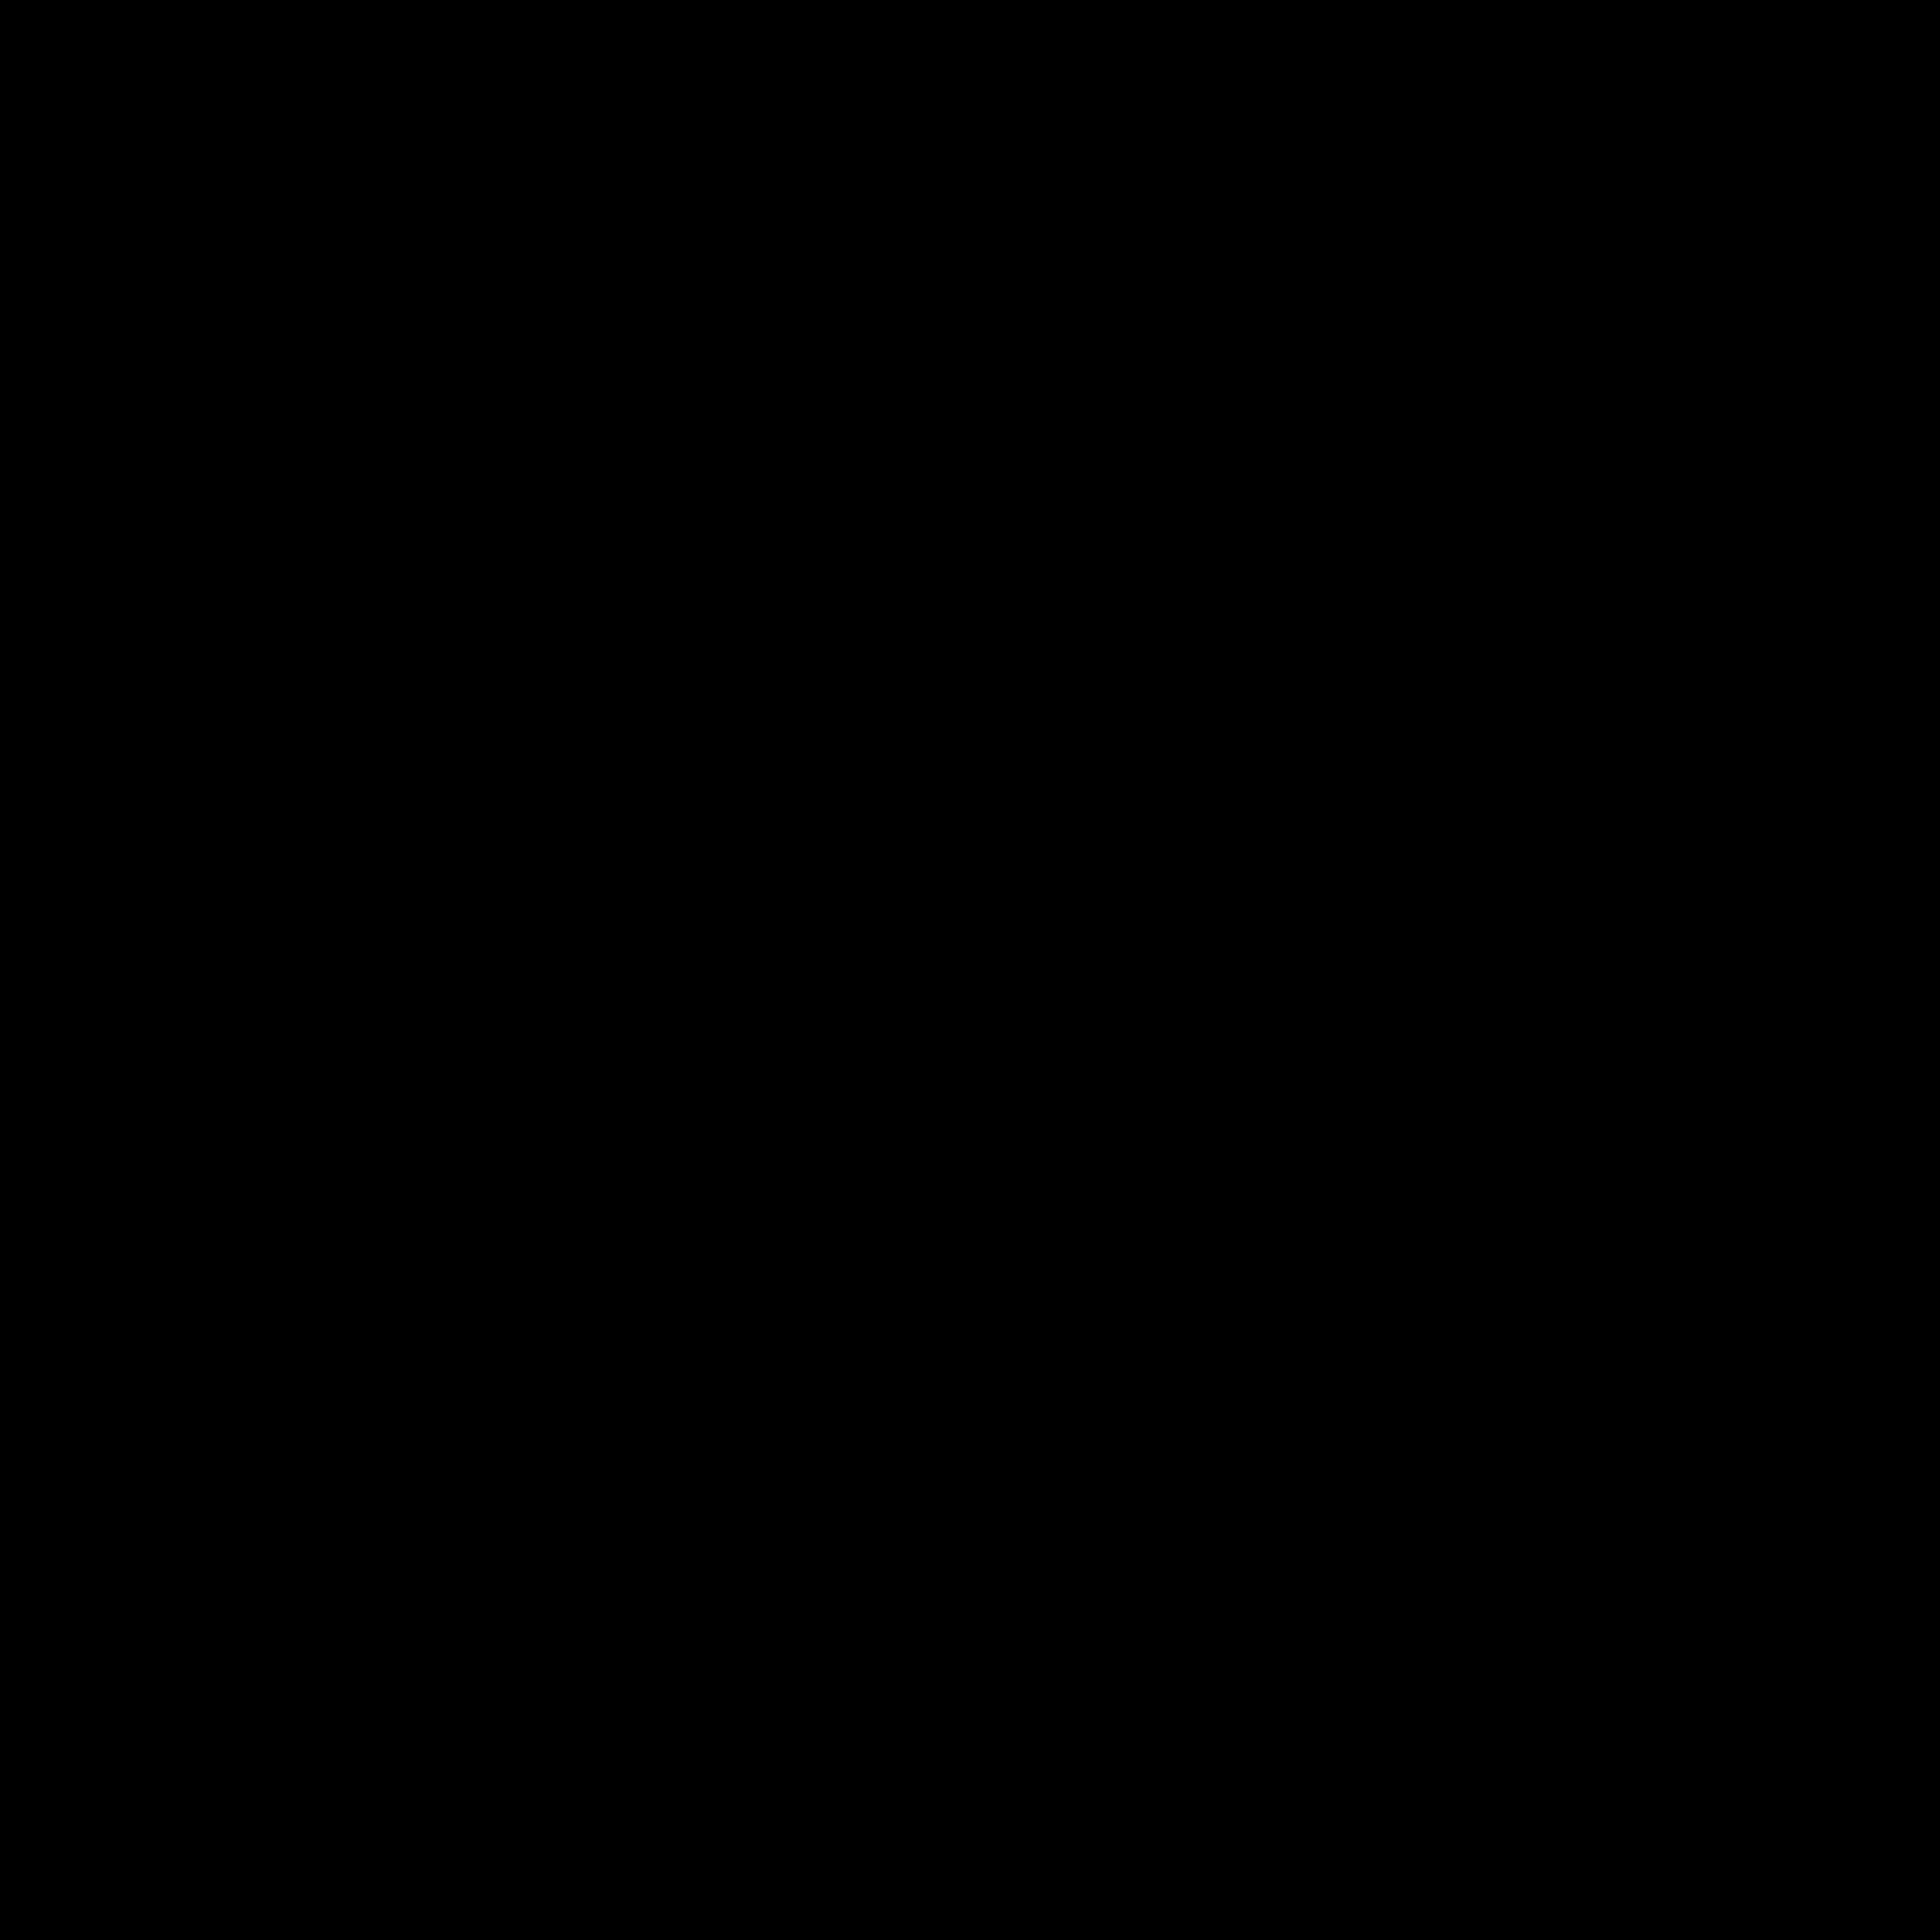 Dorint Logo